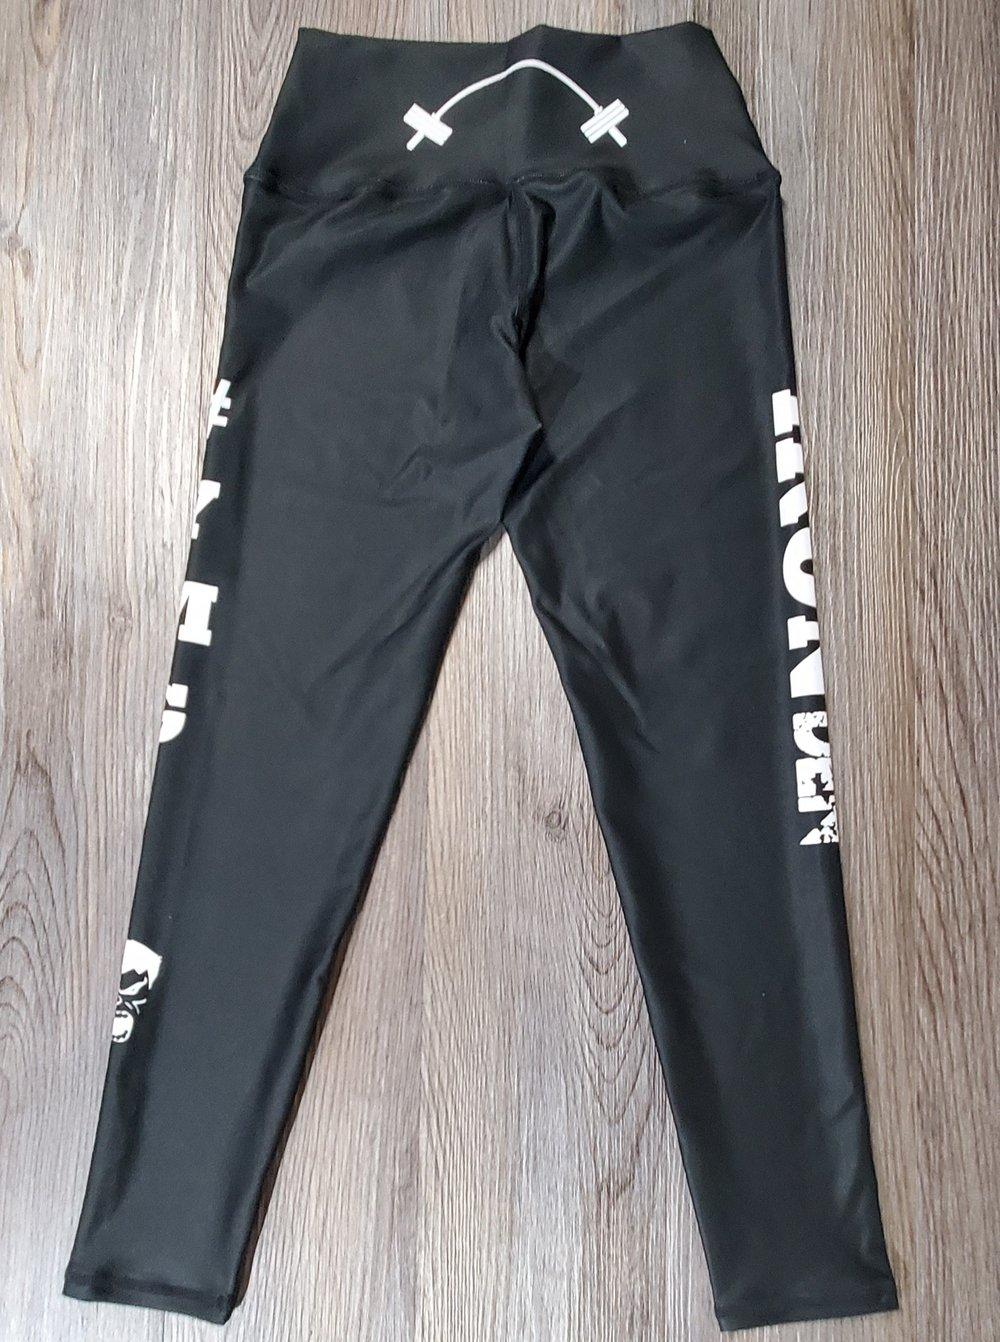 Womens leggings- You're My Goal (#YMG)